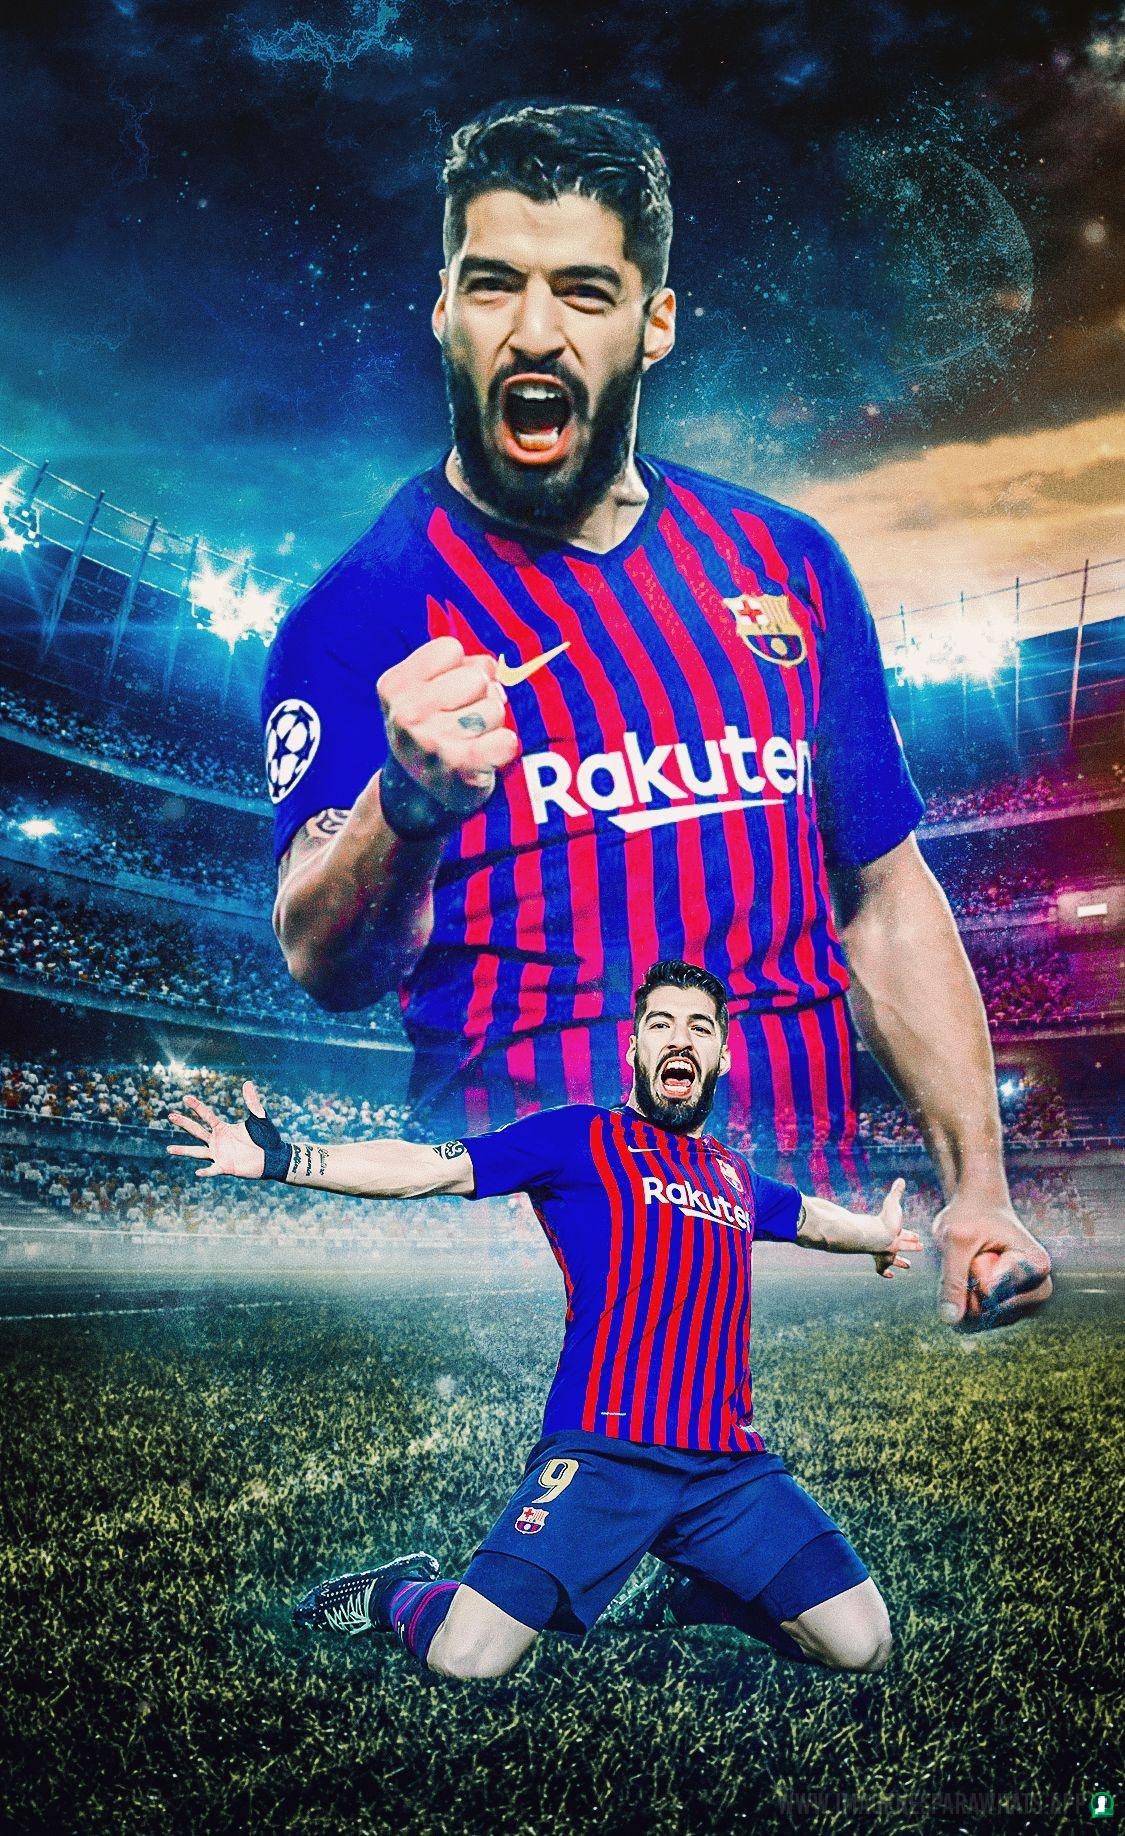 Imagenes de Futbol (1218)